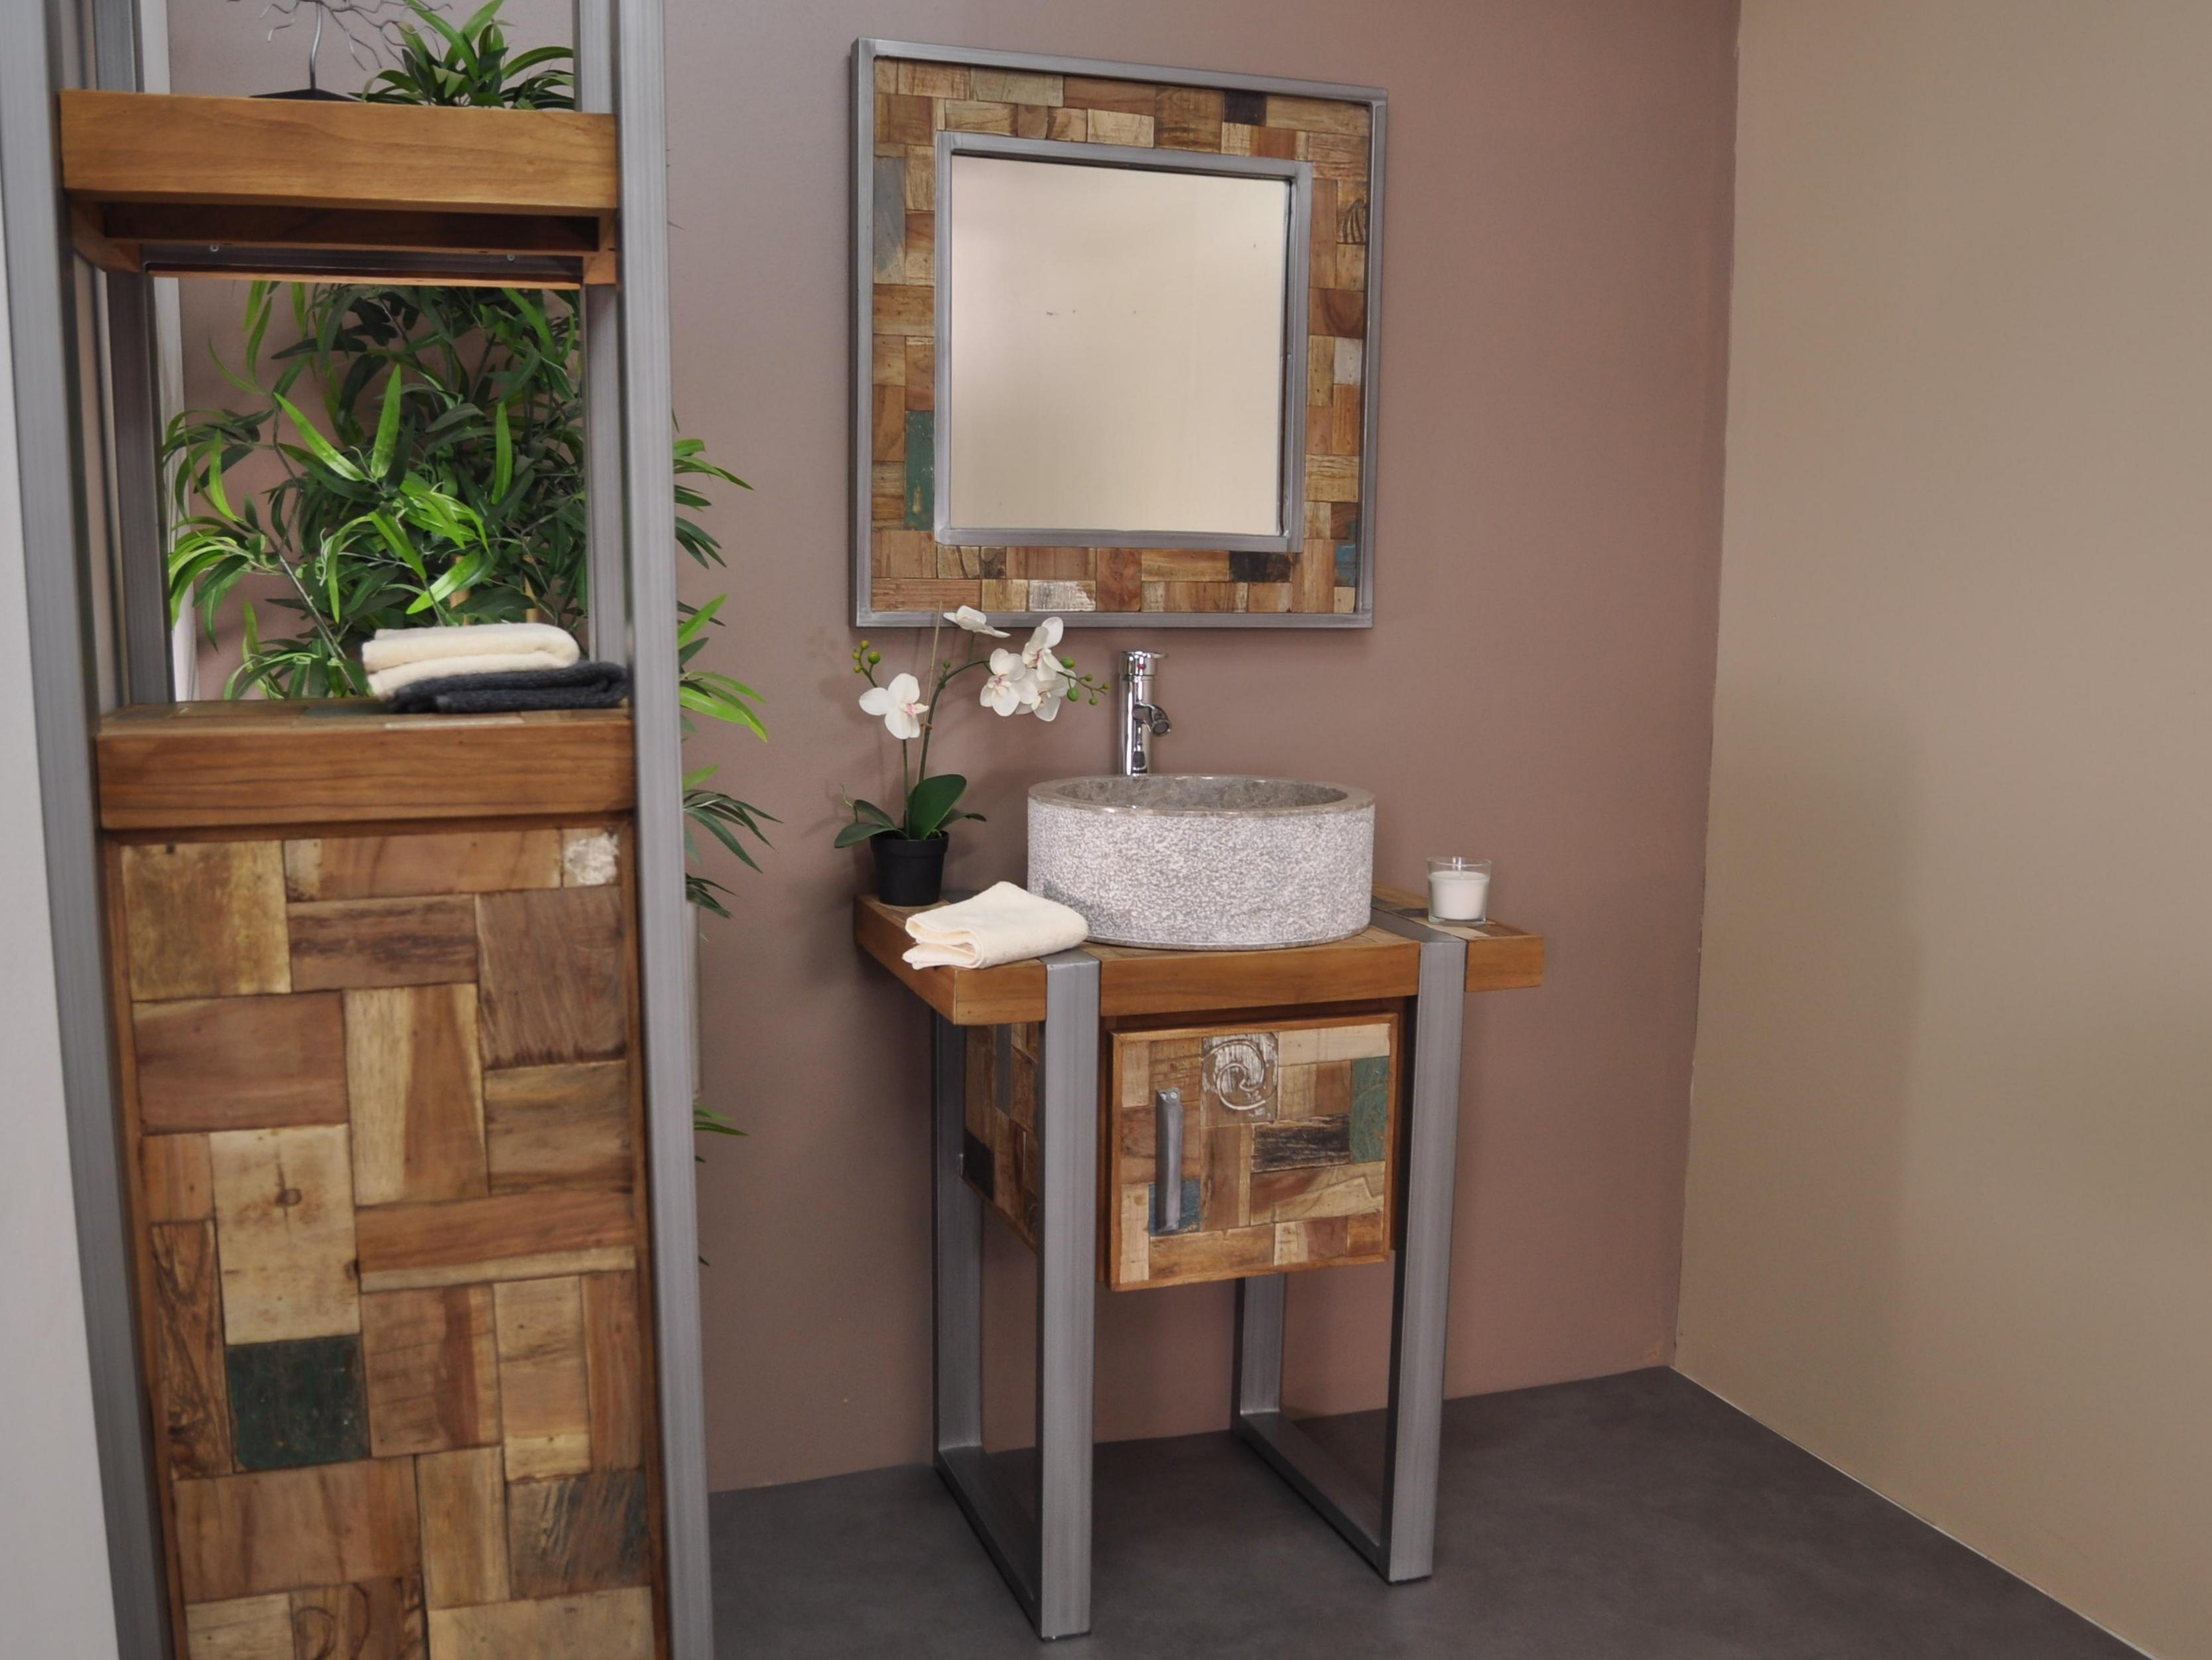 Miroir de salle de bain factory teck m tal 70x70 for Miroir 70x70